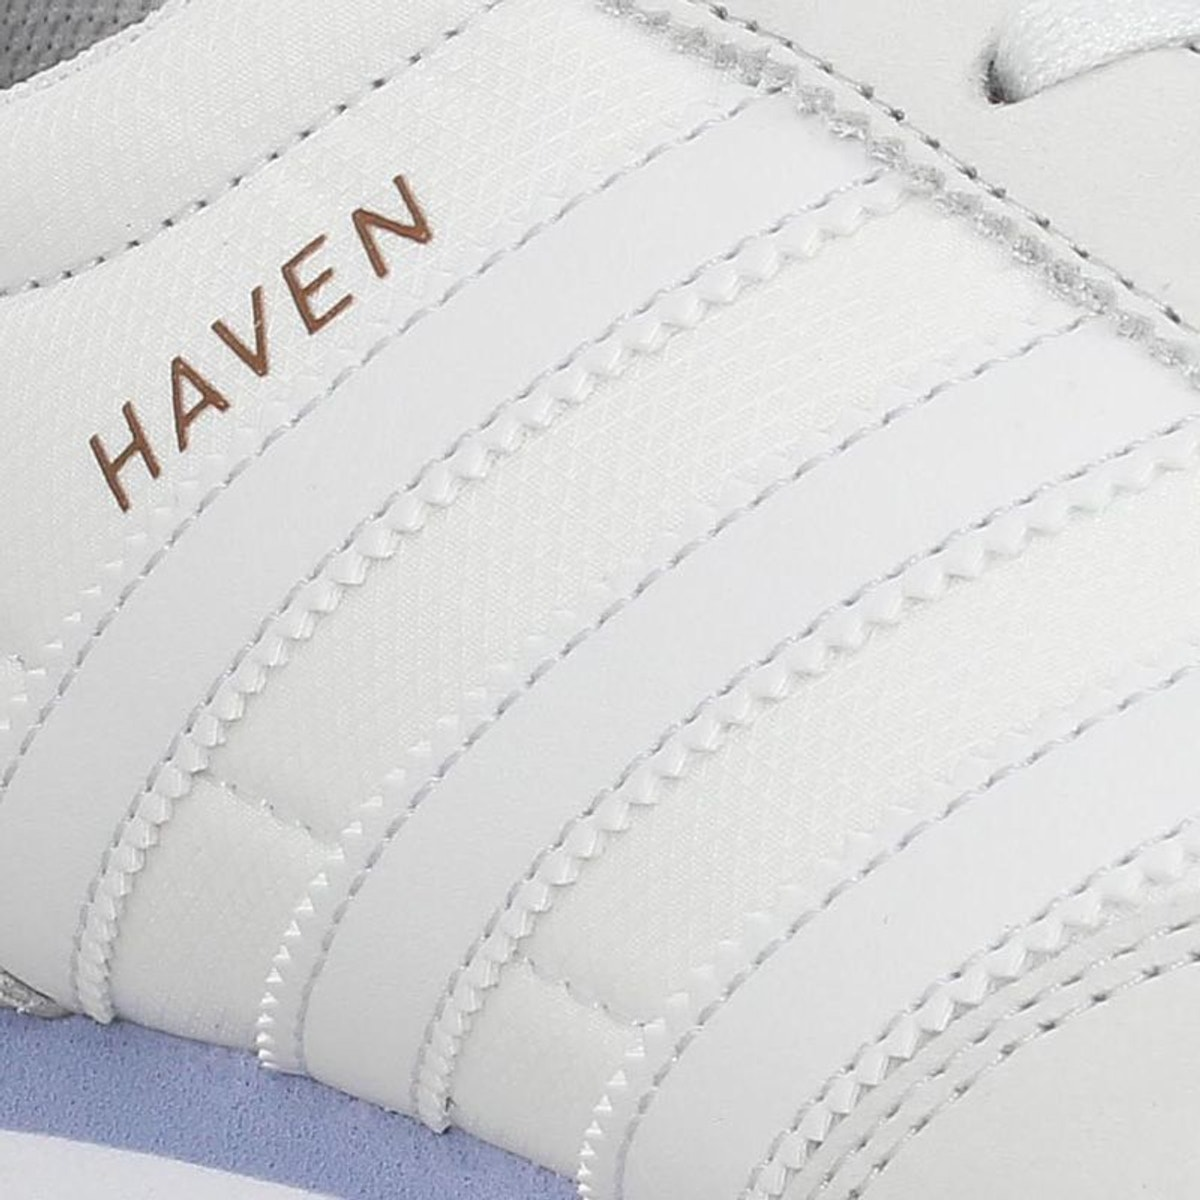 Baskets Cuir Haven Taille : 40 23   Baskets adidas, Cuir